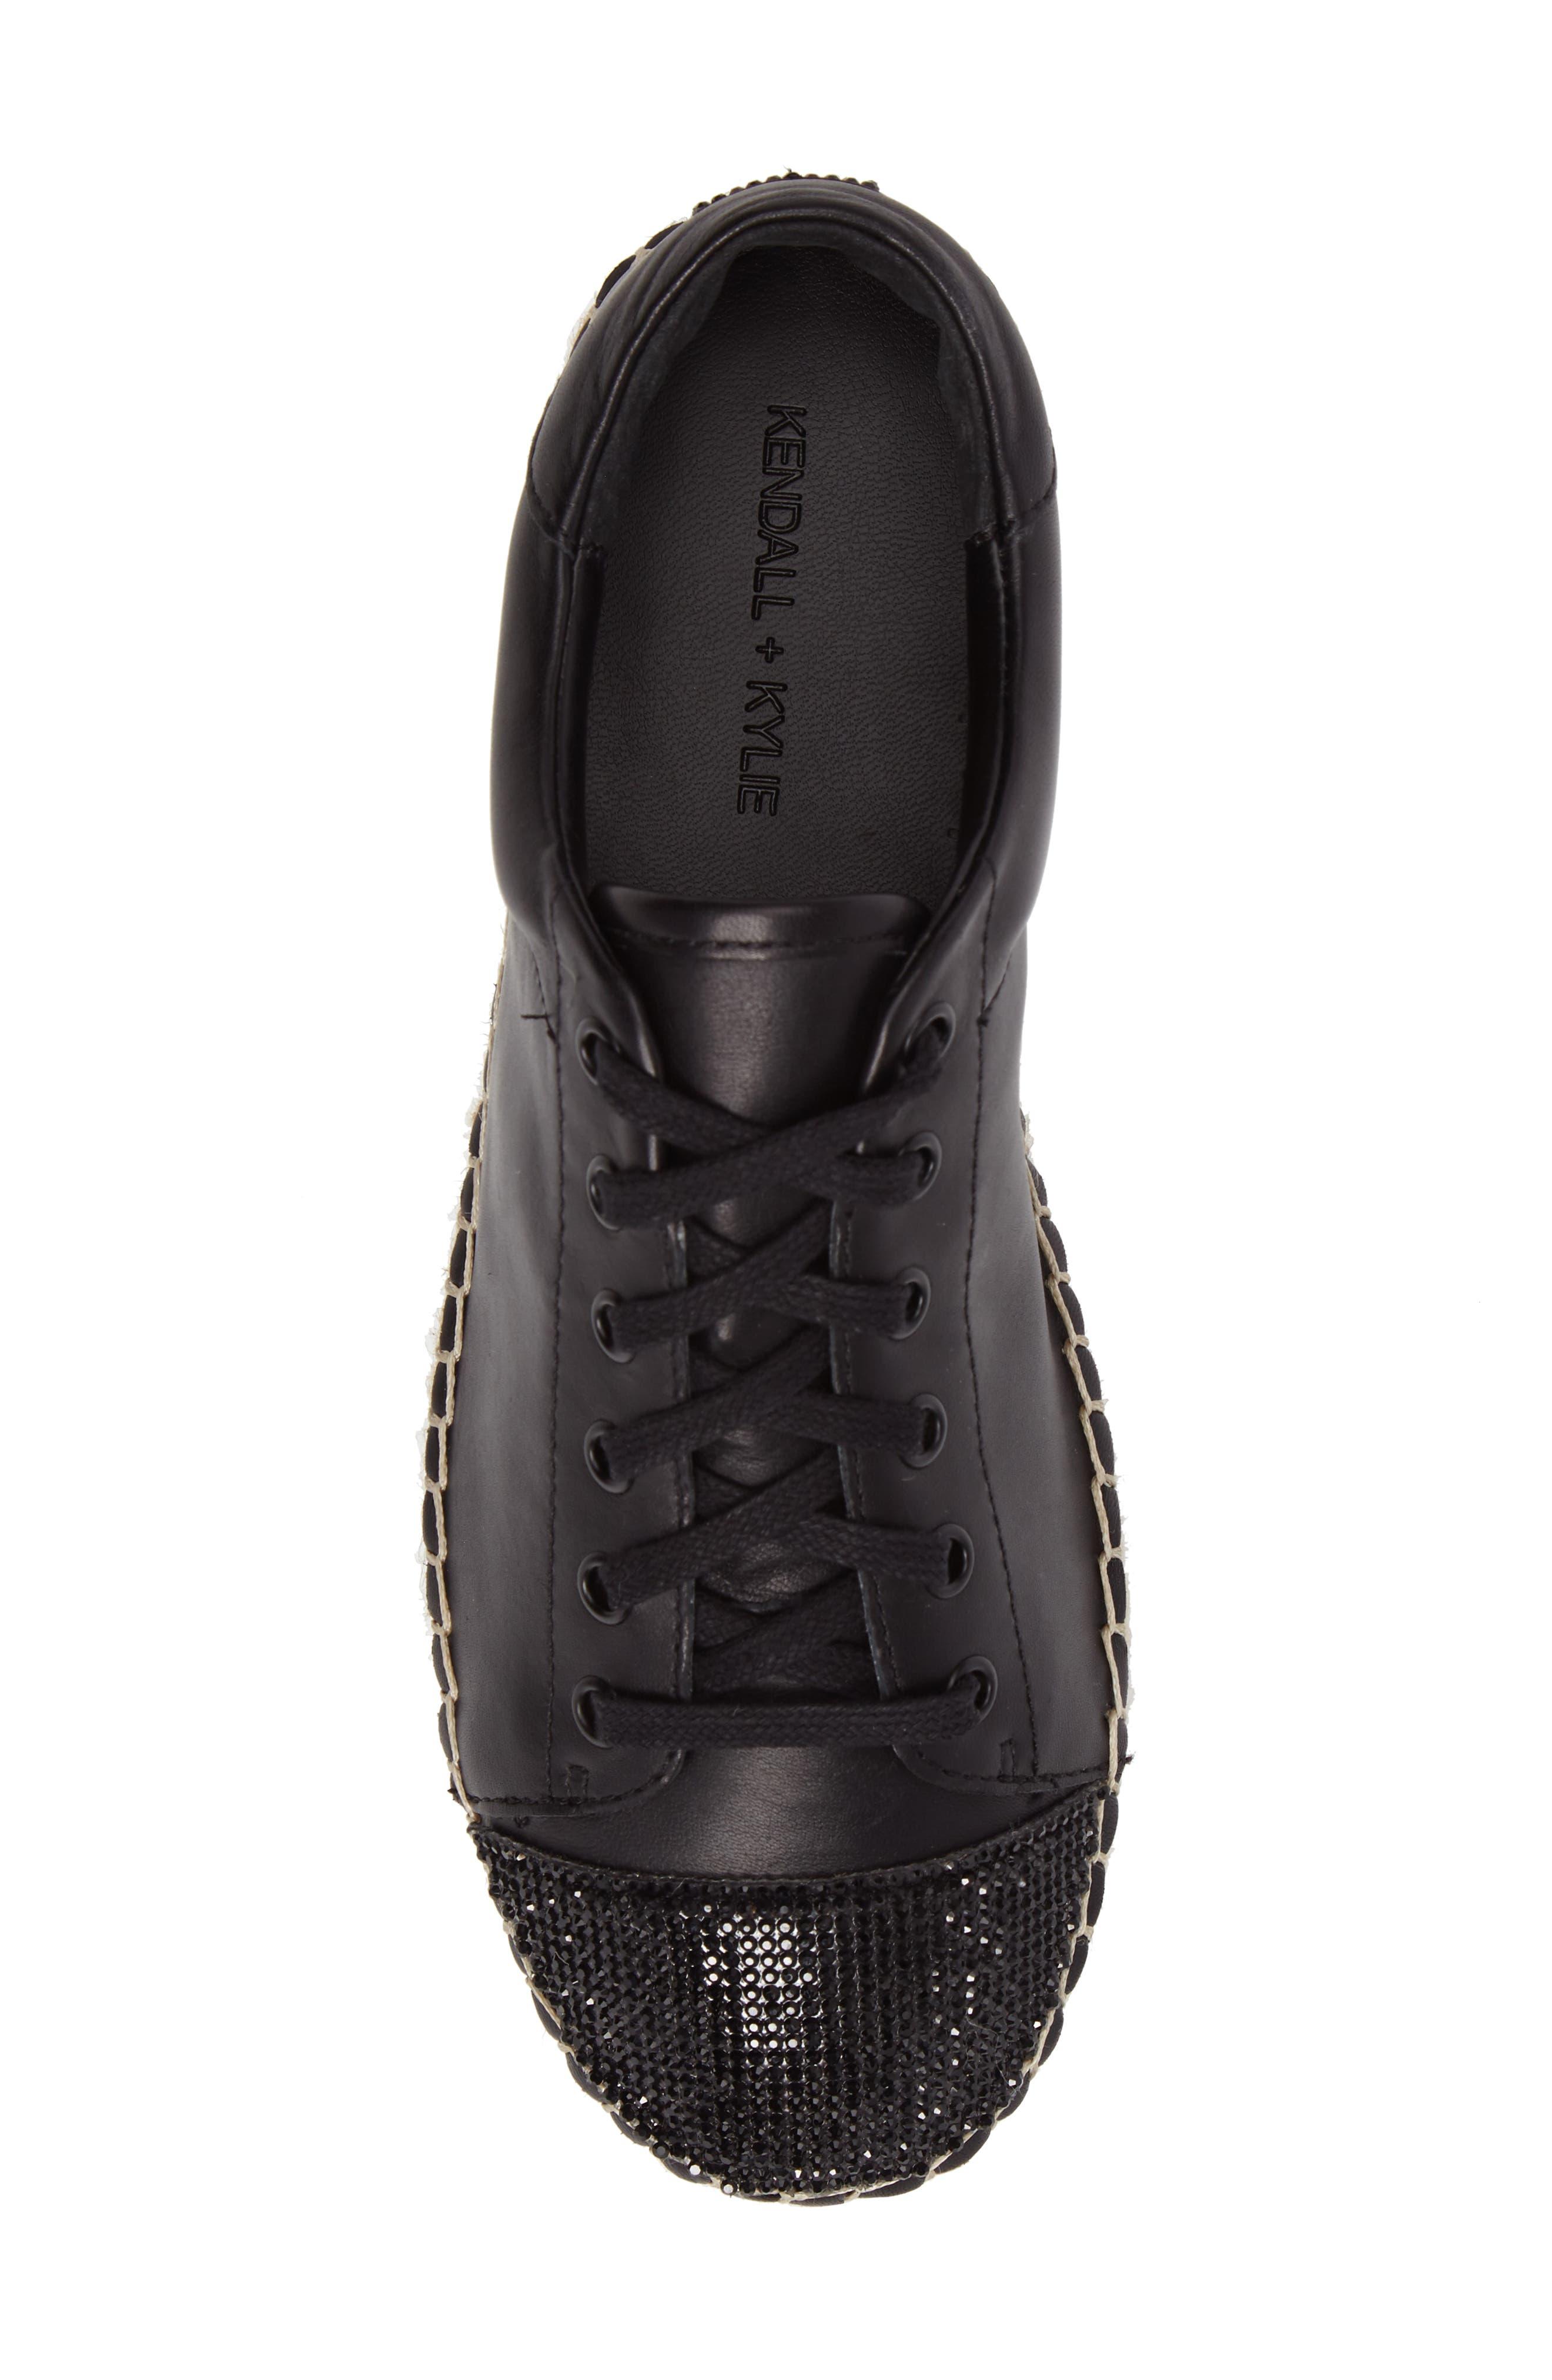 Joslyn Espadrille Sneaker,                             Alternate thumbnail 5, color,                             001